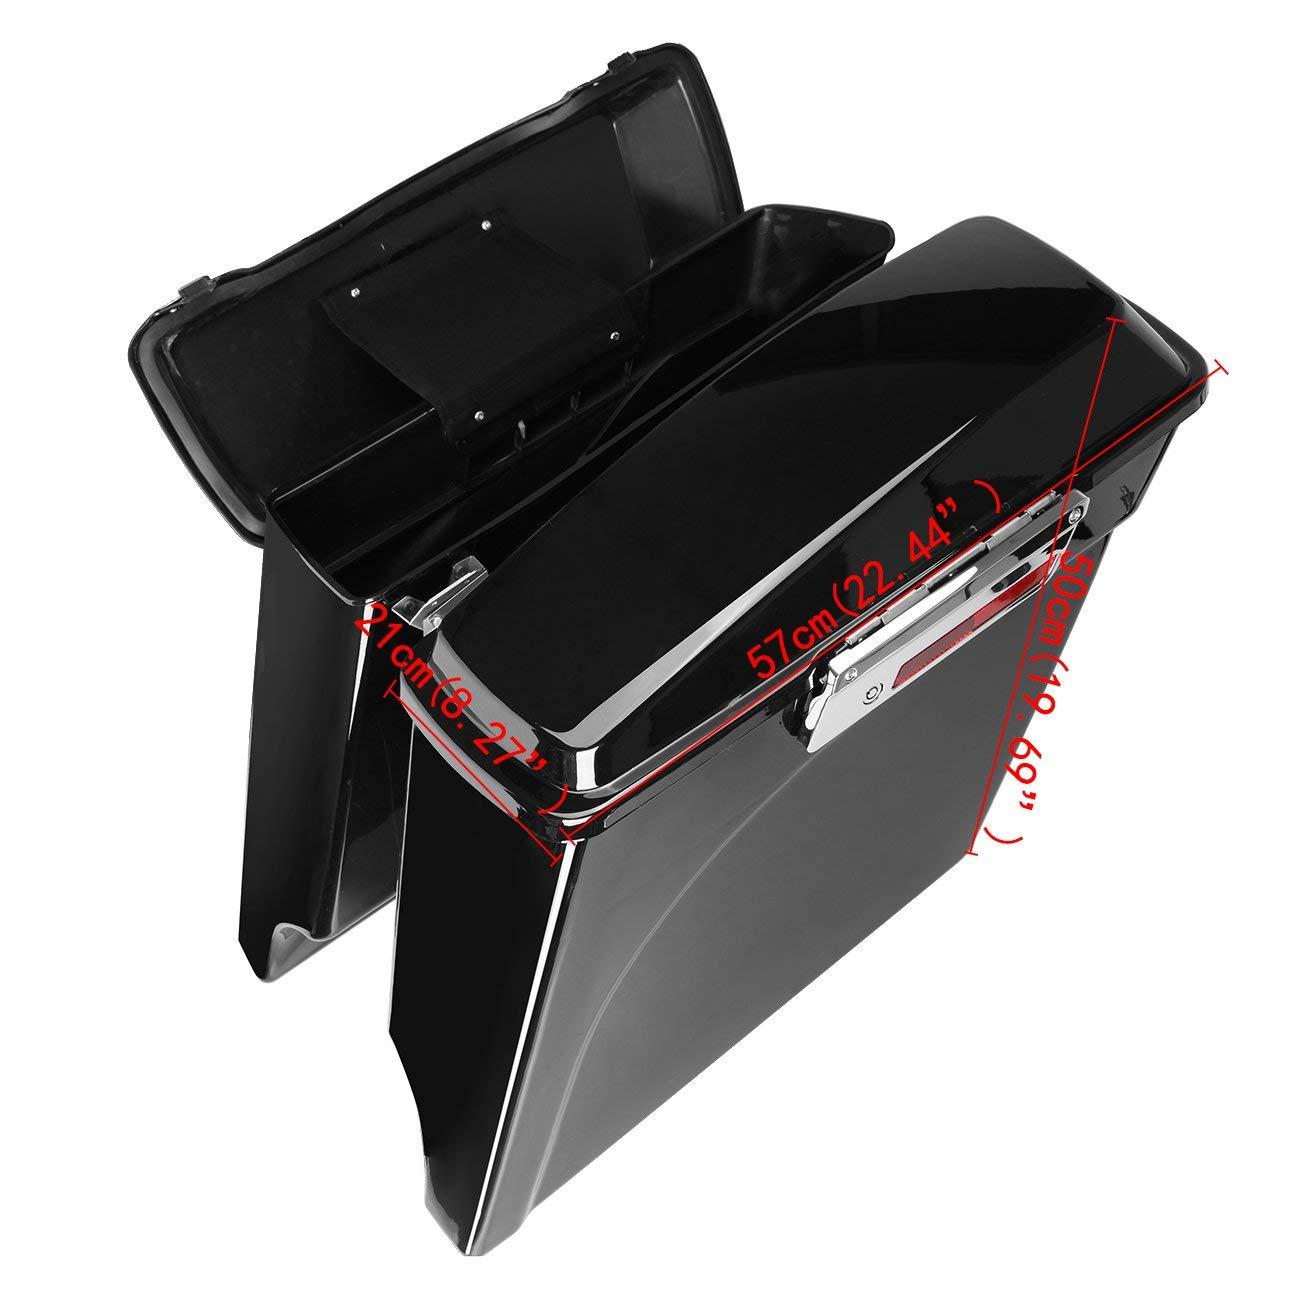 Alforjas extendidas para Harley 1993-2013